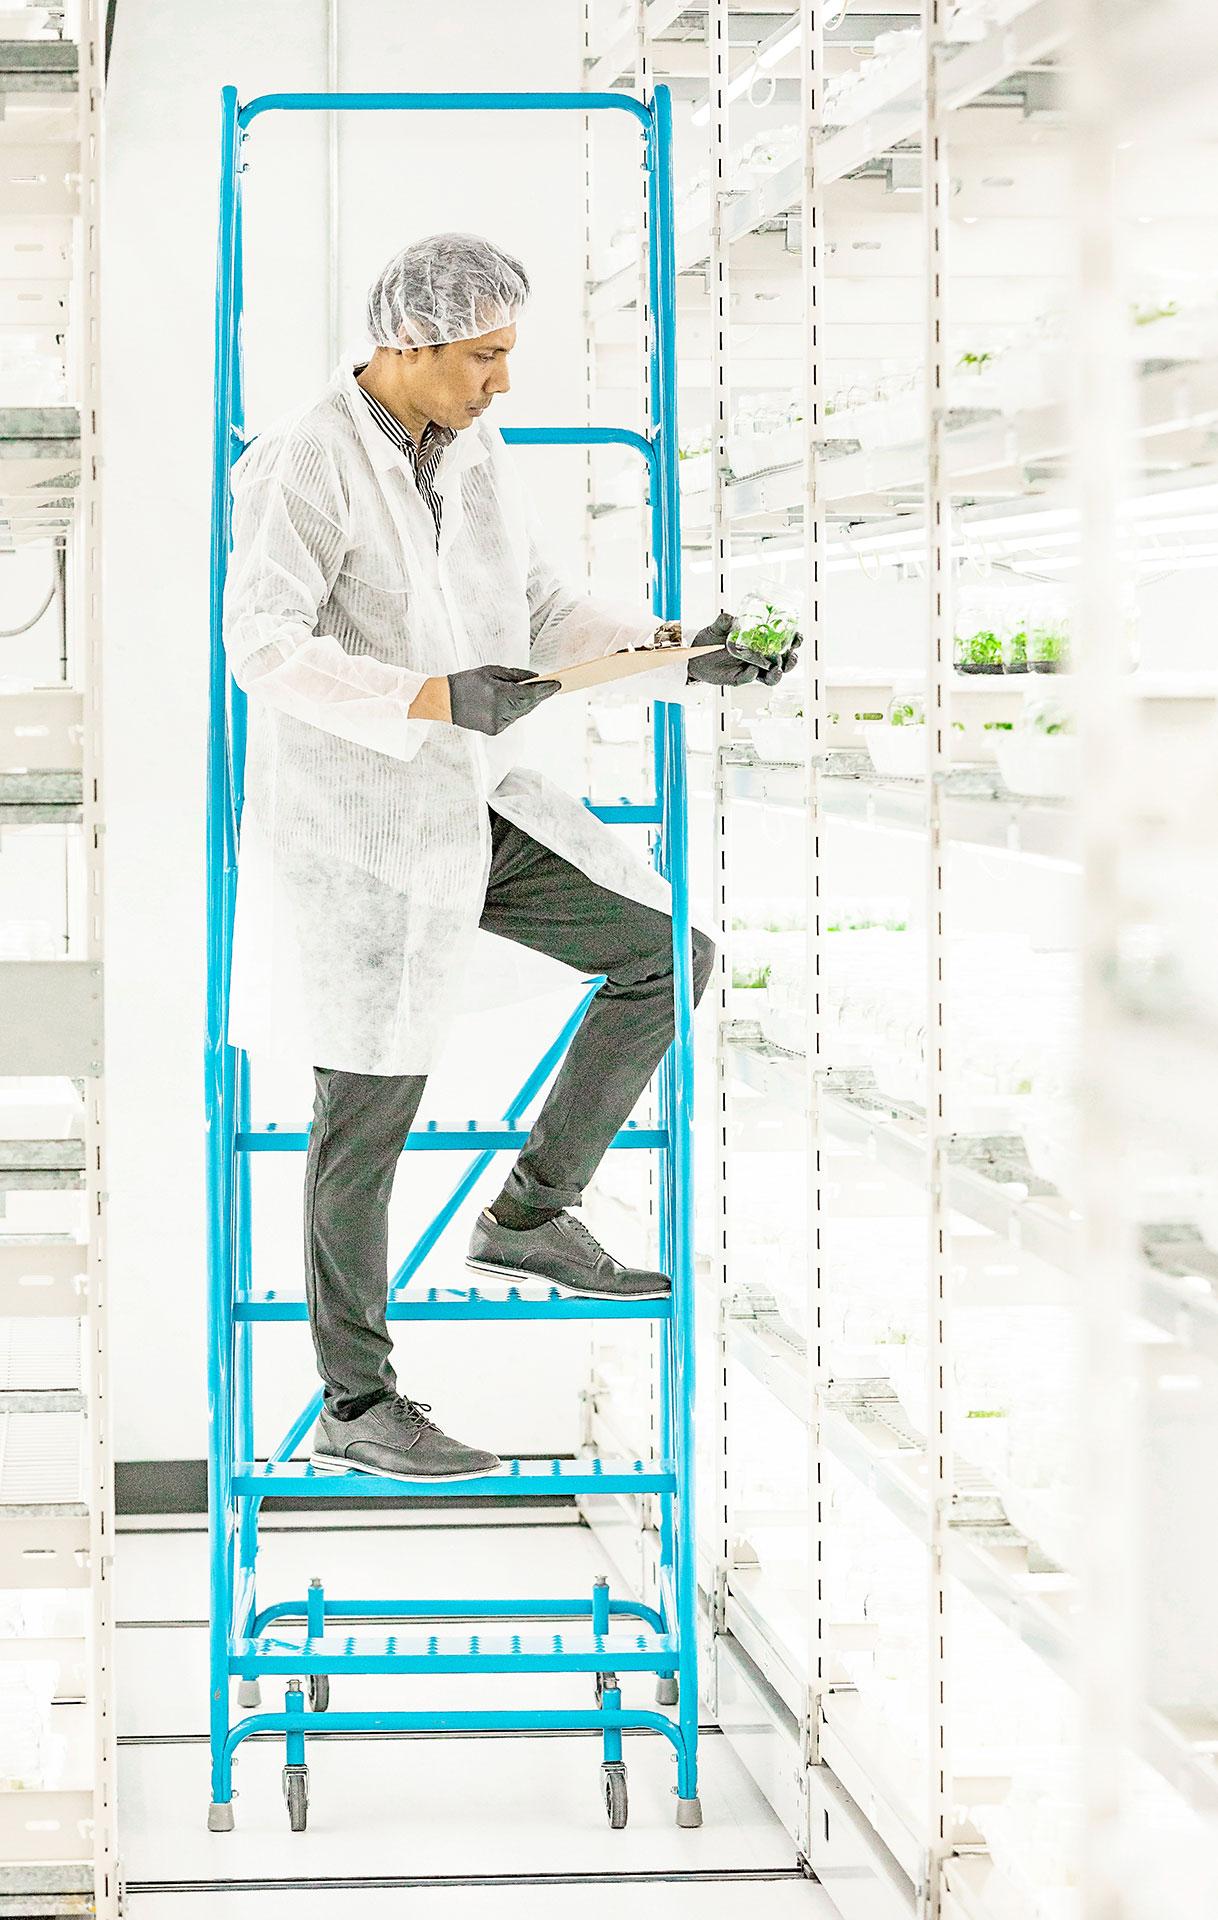 Segra Scientist in the Growing Room